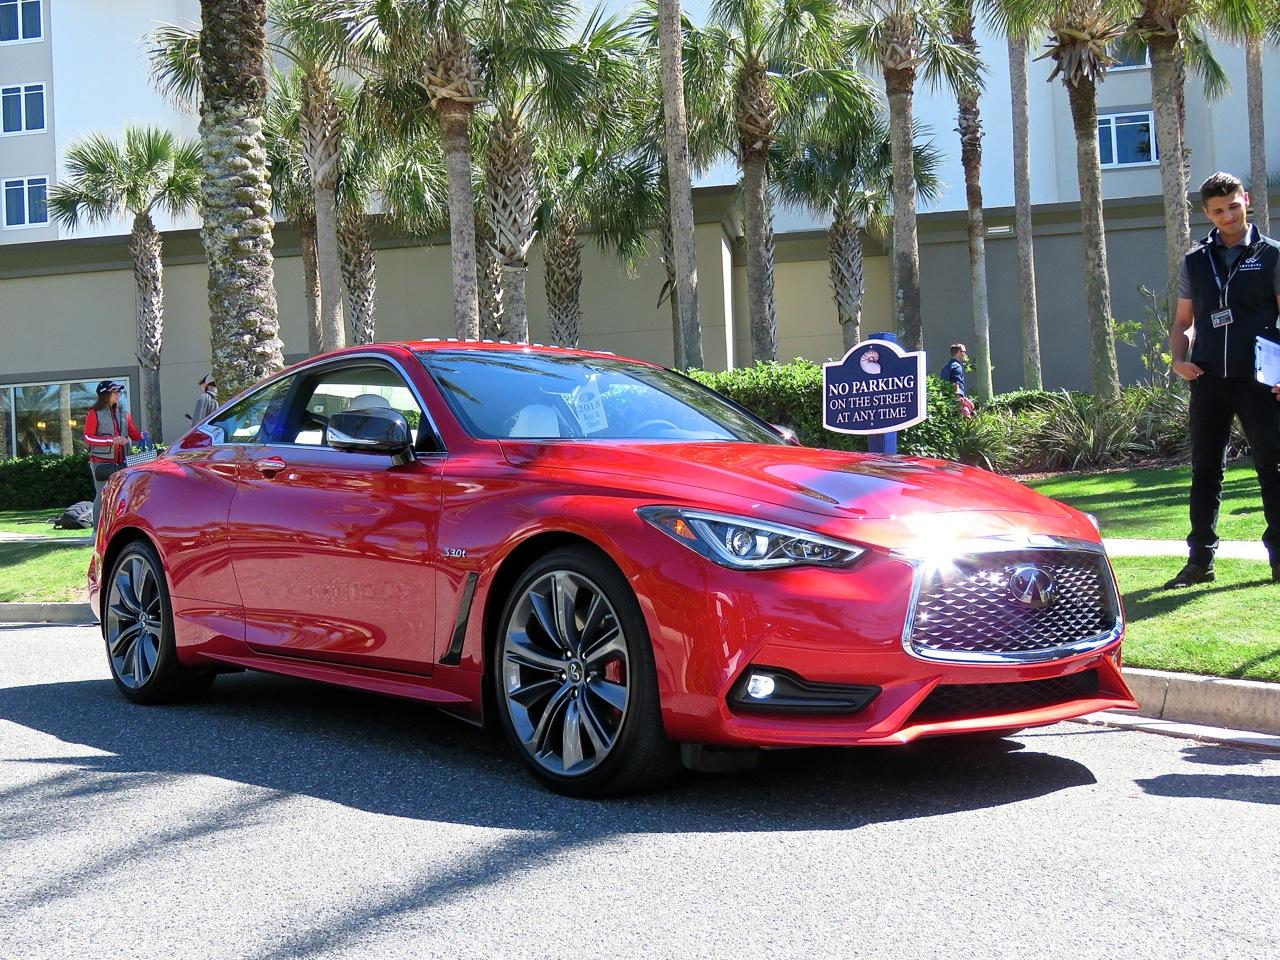 Cars Weu0027ve Driven, Luxury Cars, Performance Models, Uncategorized